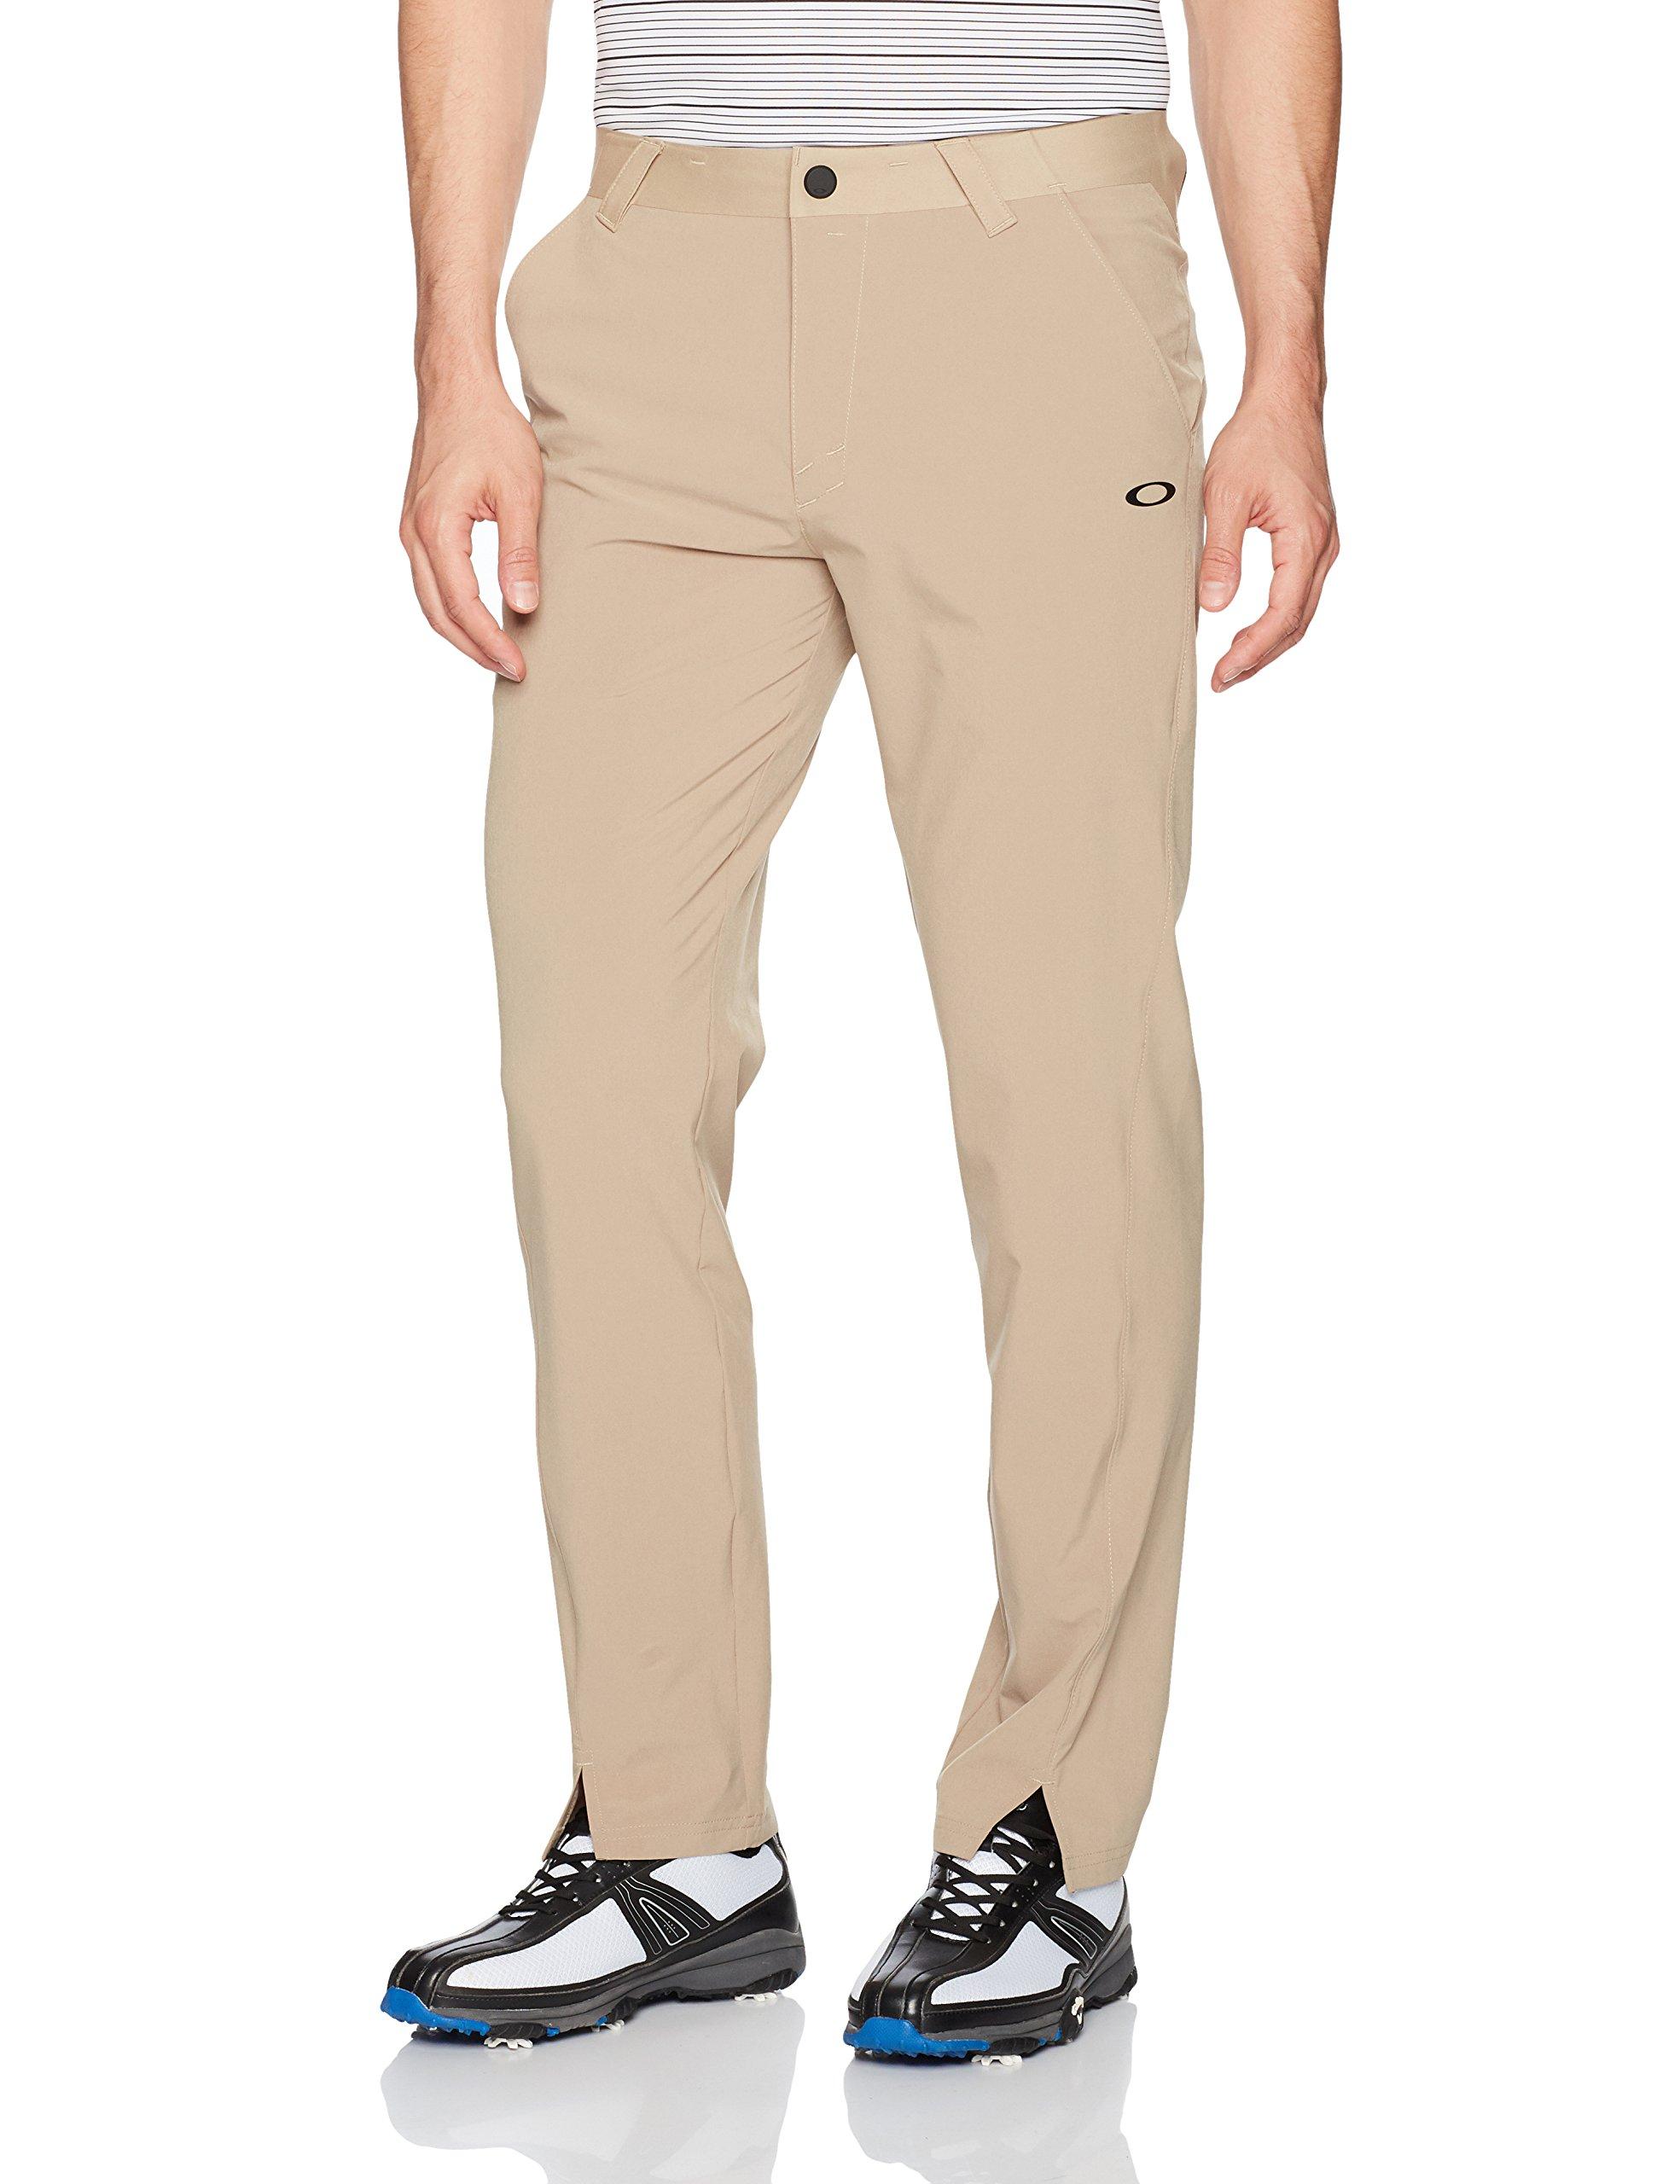 Oakley Men's Velocity Pant, Rye, 28X32